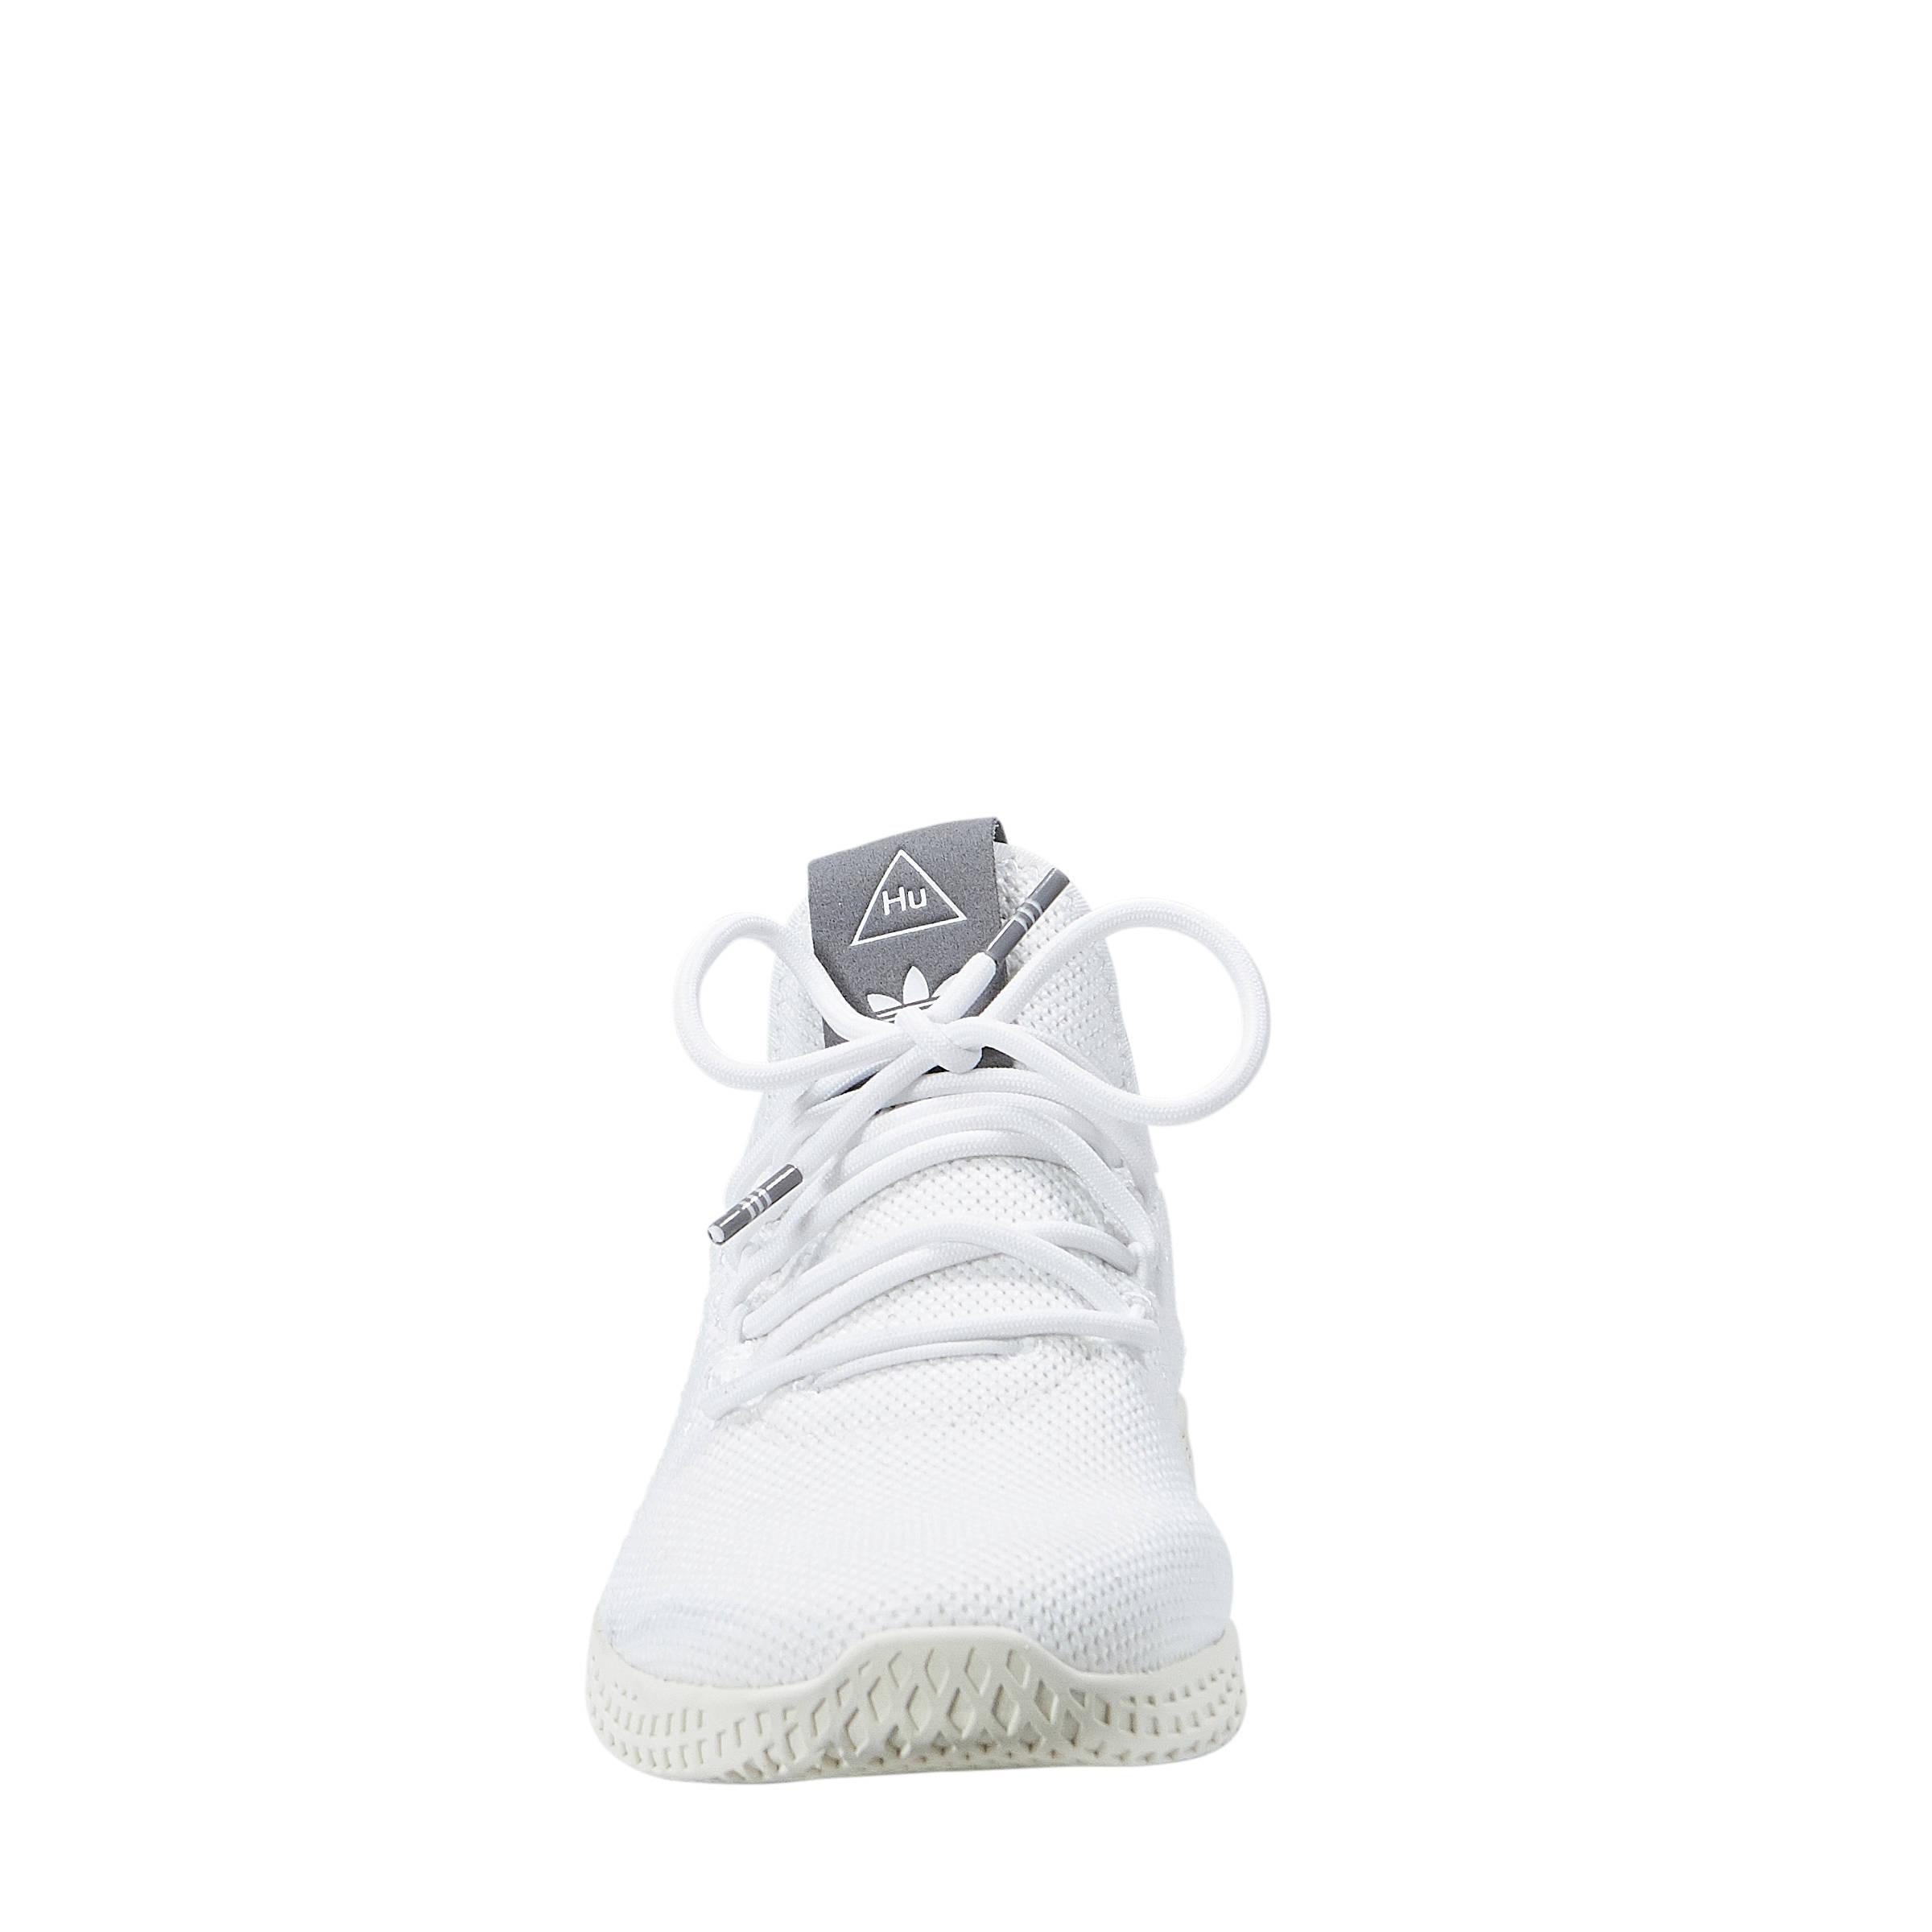 Heren Adidas Sneakers | PW Tennis Hu sneakers Grijs